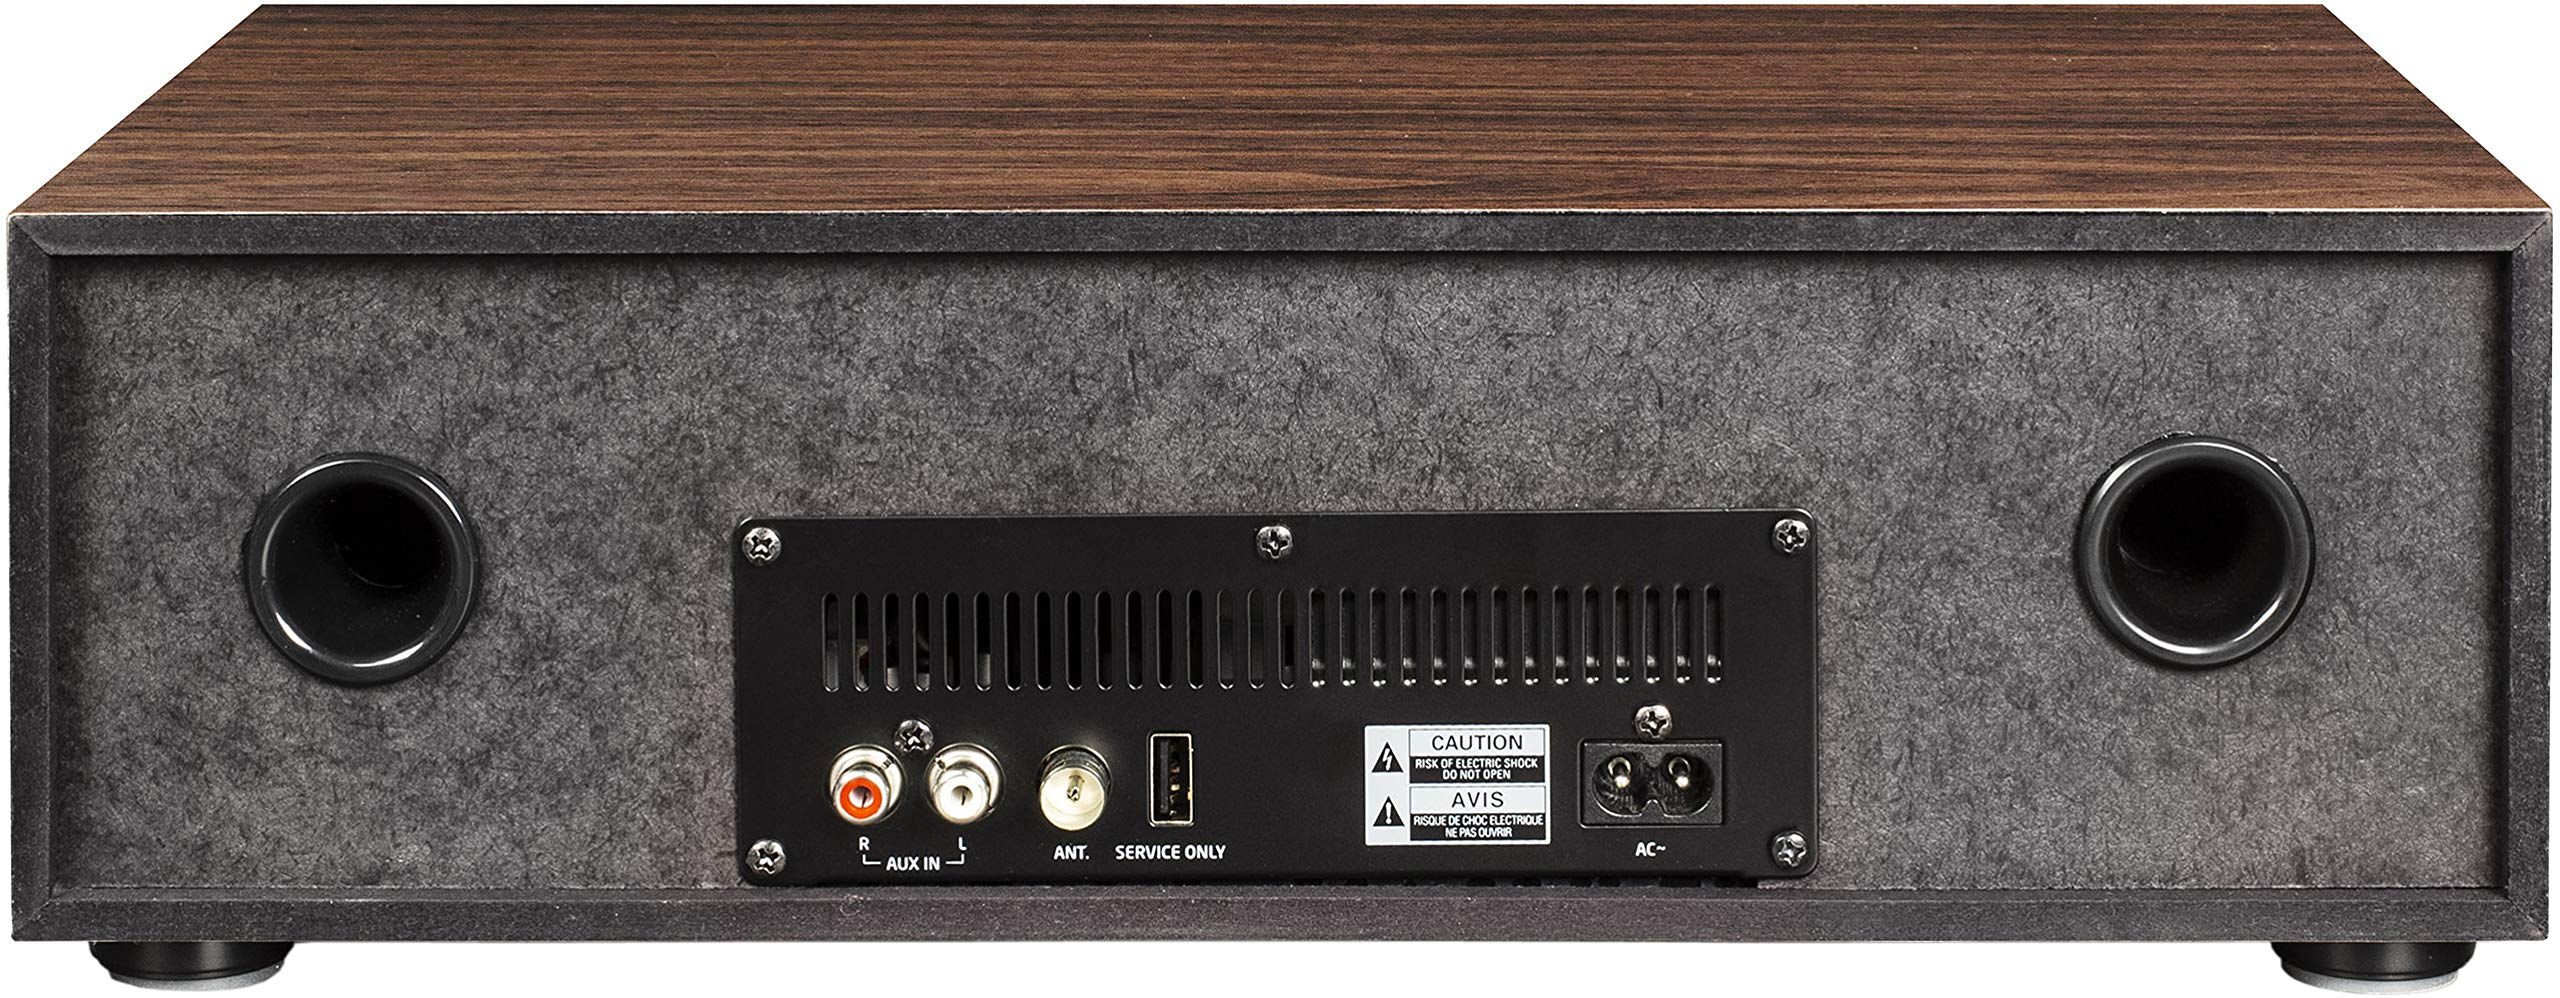 Crosley CR3501A-WA Fleetwood Bluetooth FM Clock Radio and CD Player, Walnut by Crosley (Image #4)